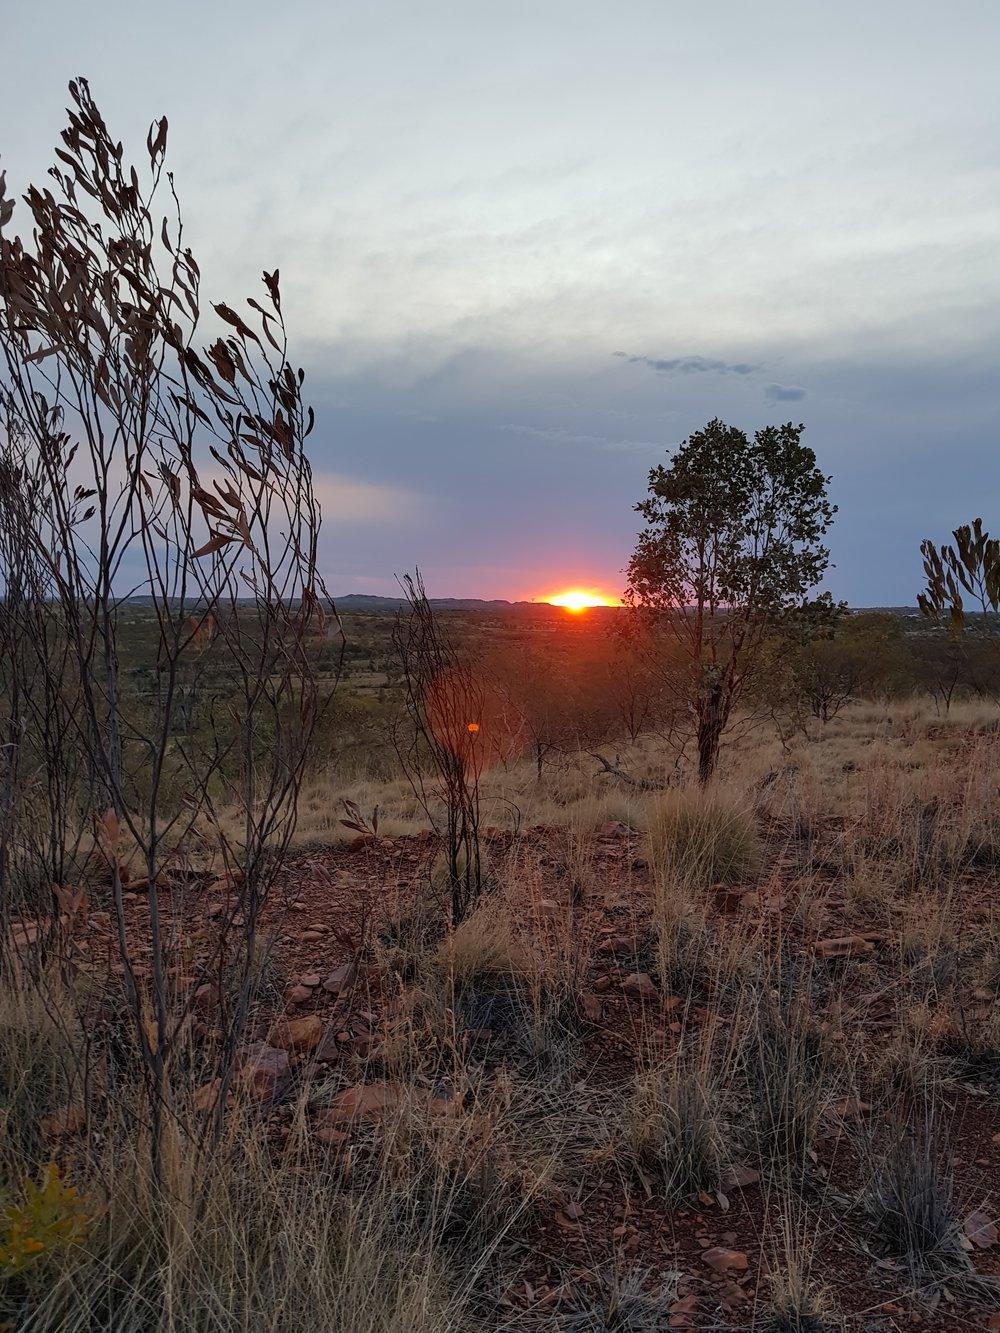 A sunset in Tennant Creek